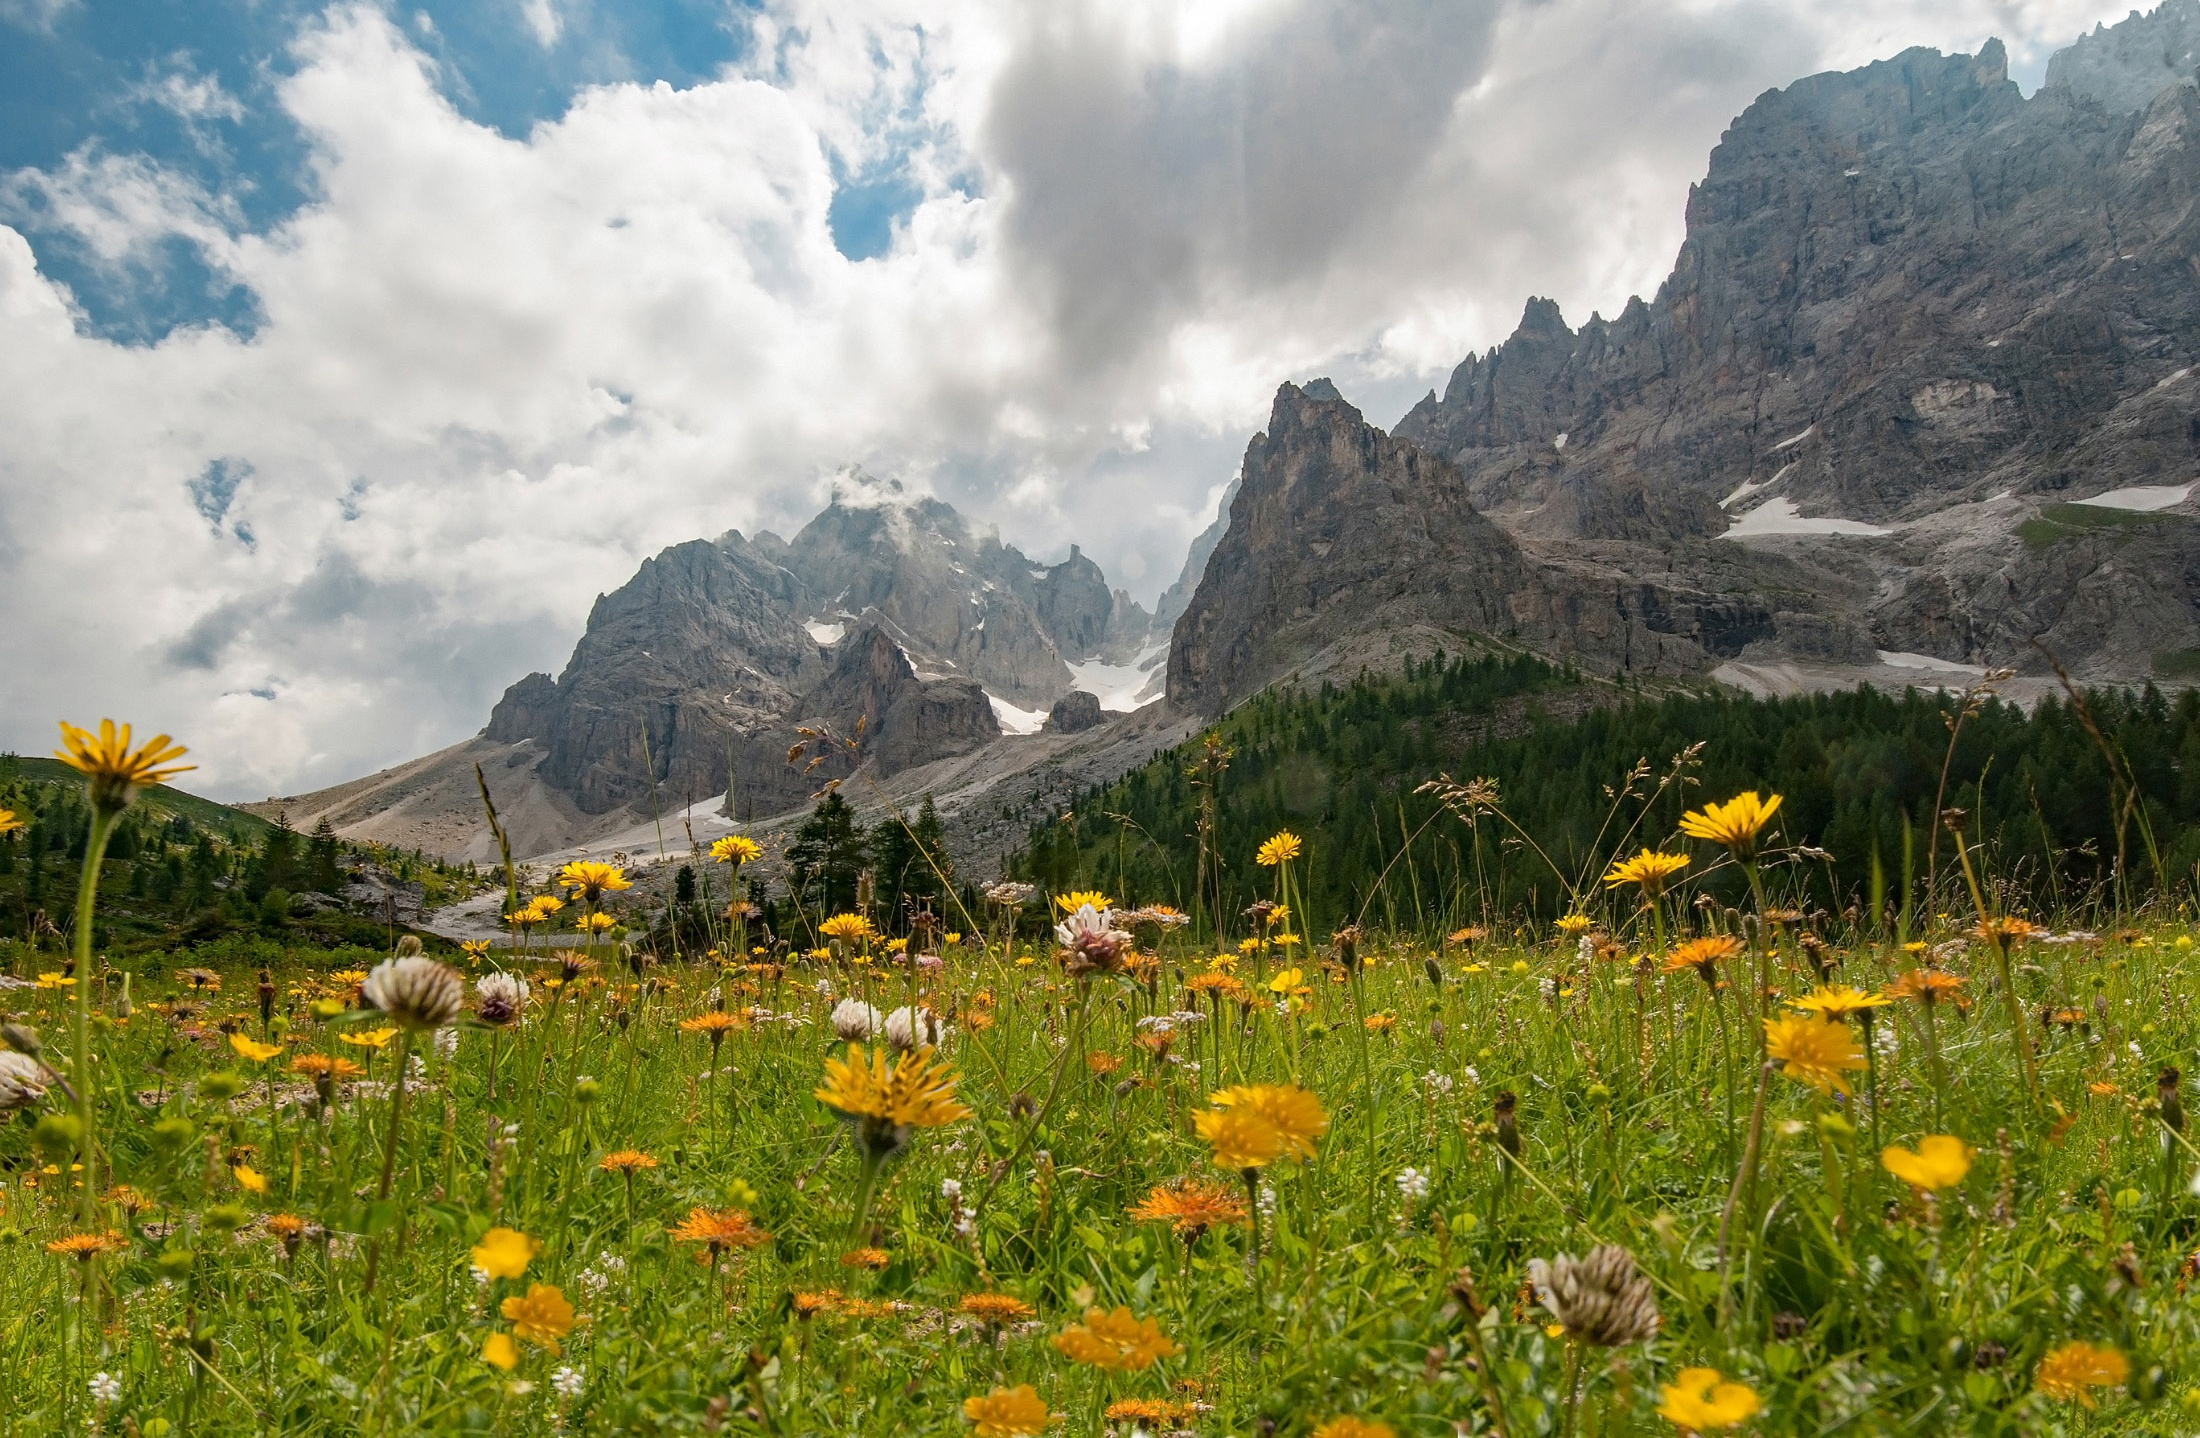 Summer Flower Alps Meadow Dolomites 2200x1438